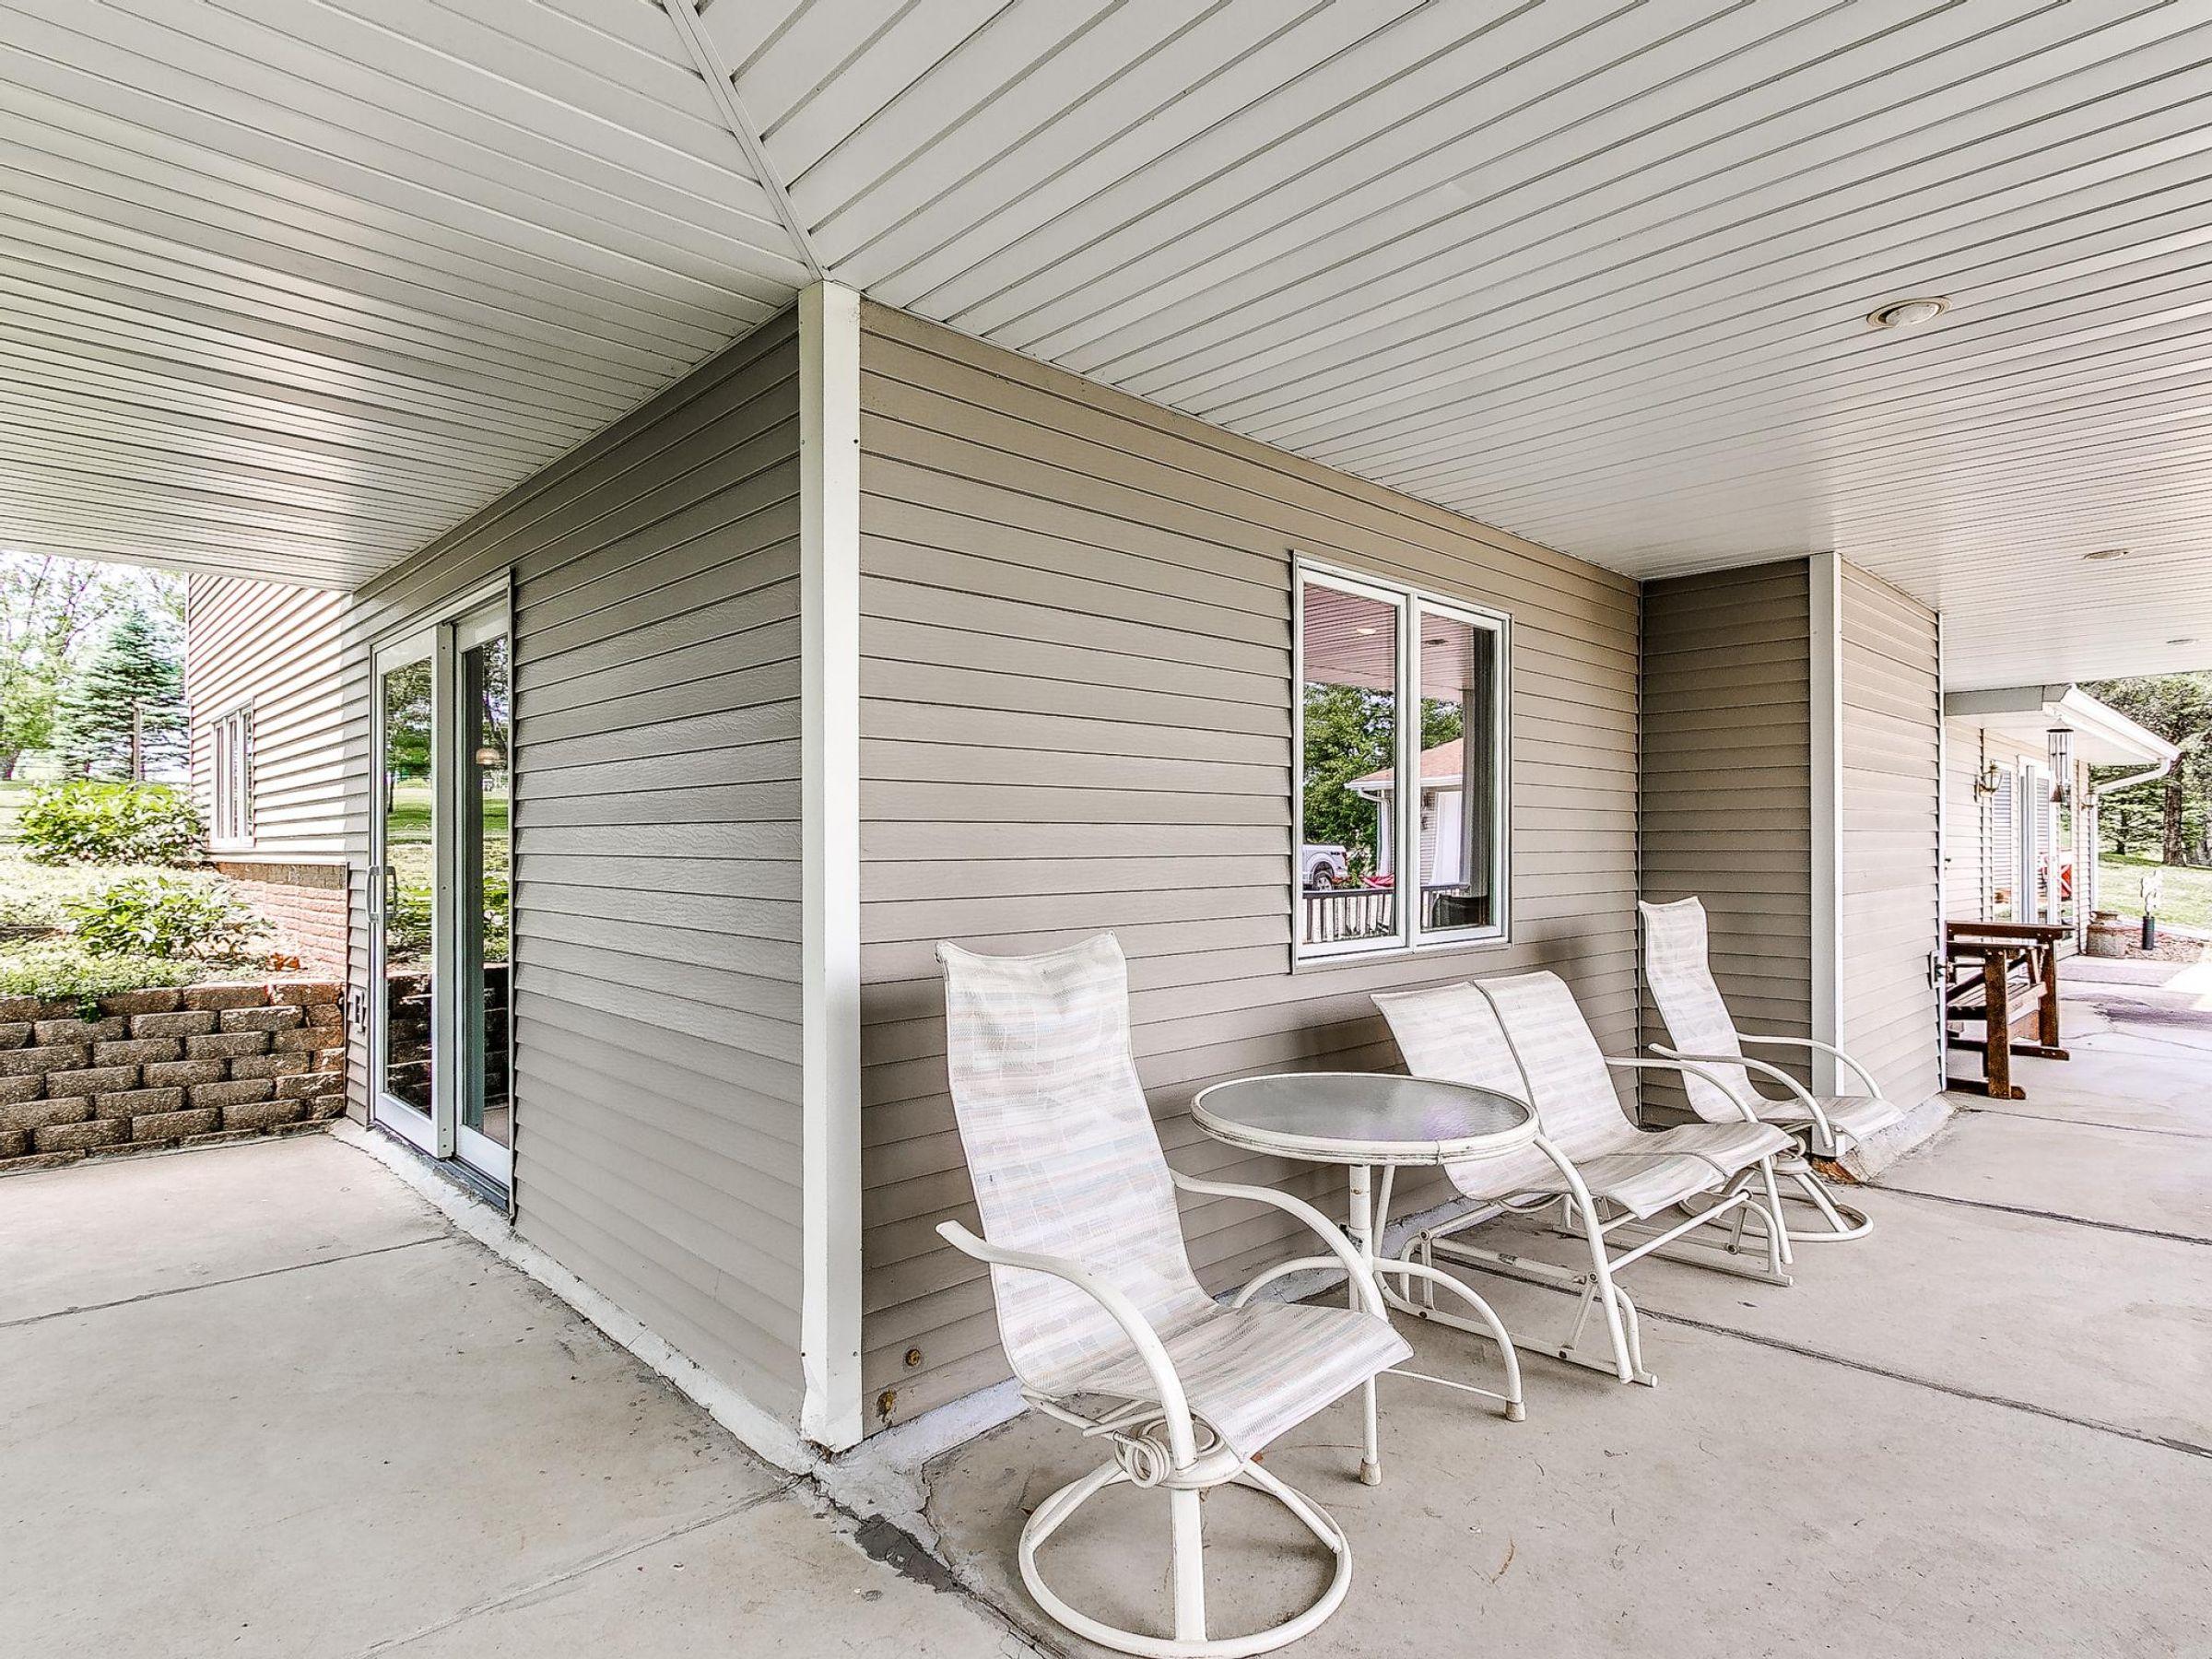 residential-warren-county-iowa-3-acres-listing-number-15593-5-2021-06-18-160046.jpg